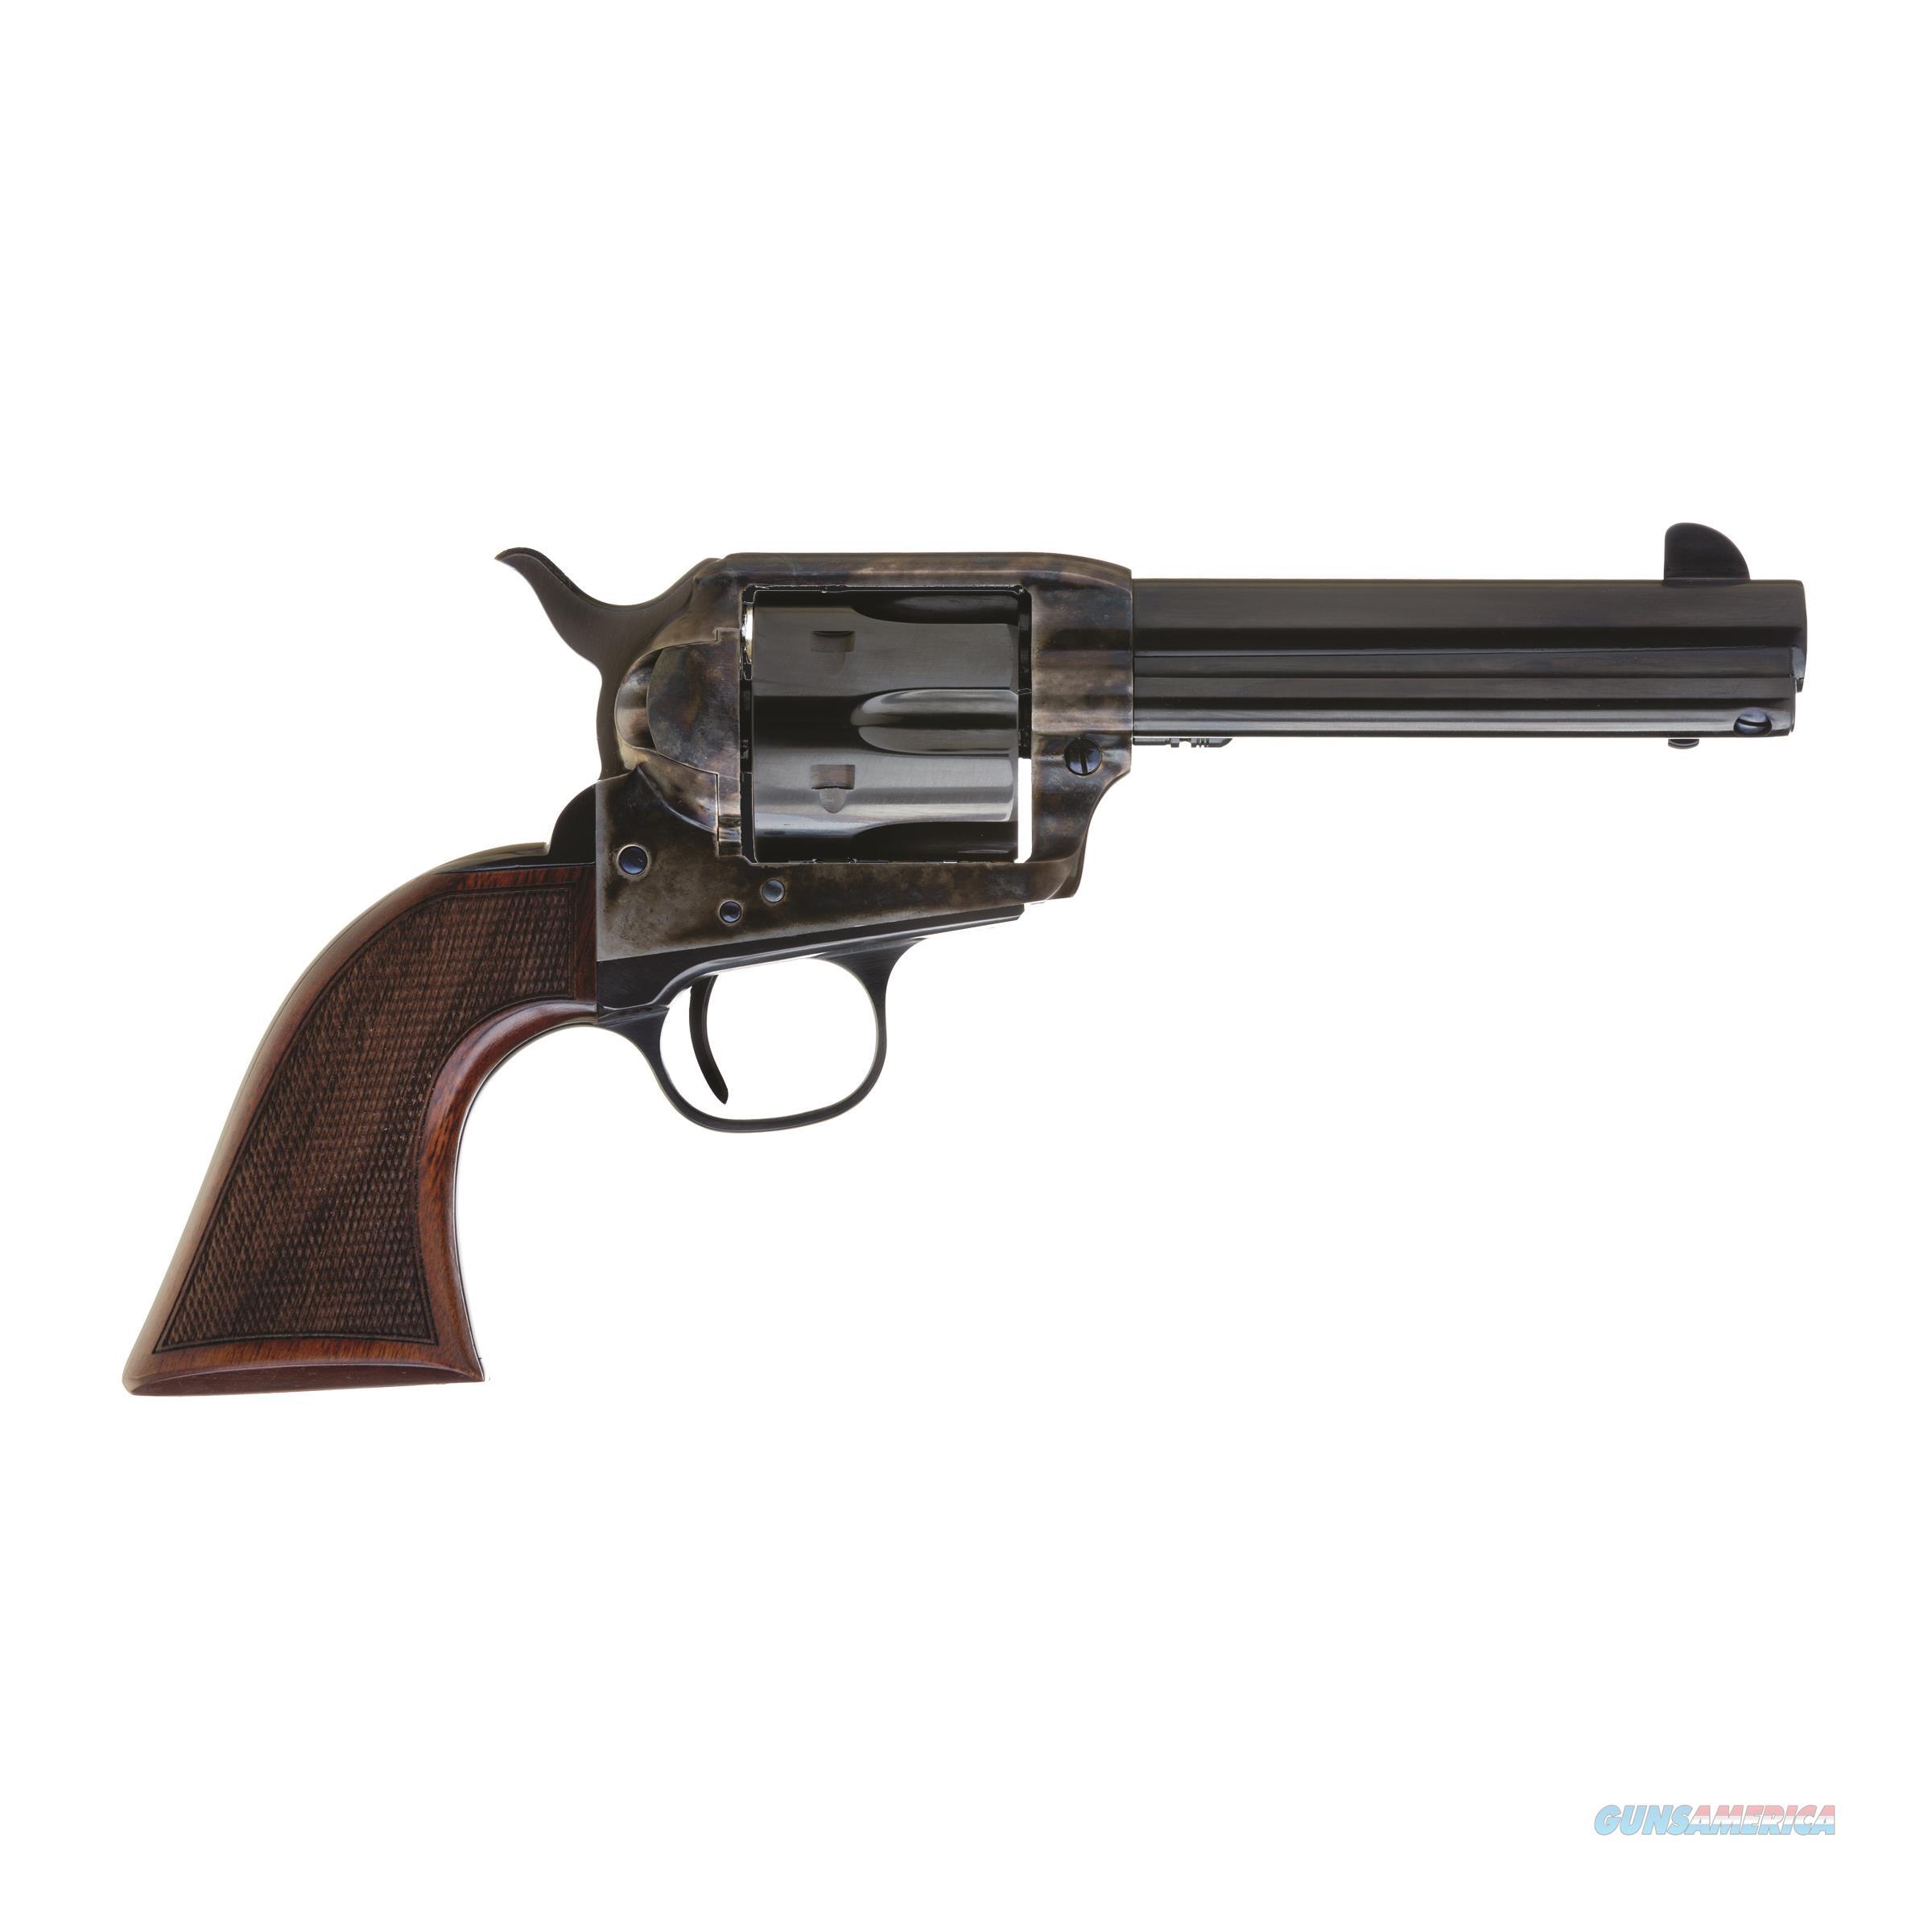 "Cimarron Evil Roy Competition .45 LC Revolver 4.75"" 6 Rds ER4100   Guns > Pistols > Cimarron Pistols"